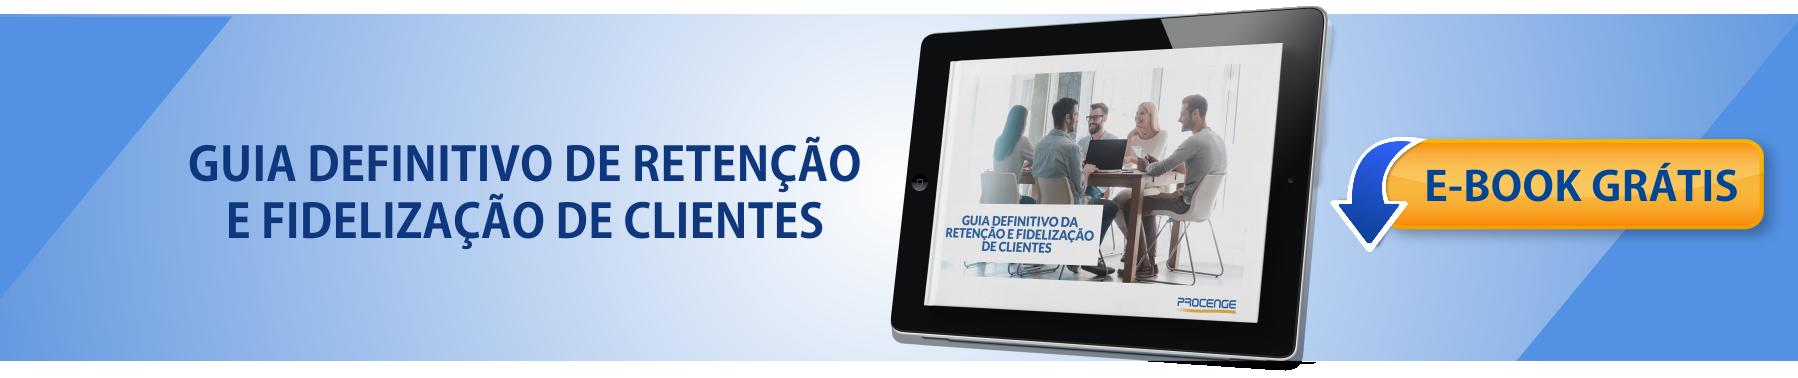 cta-horizontal-RETENCAO